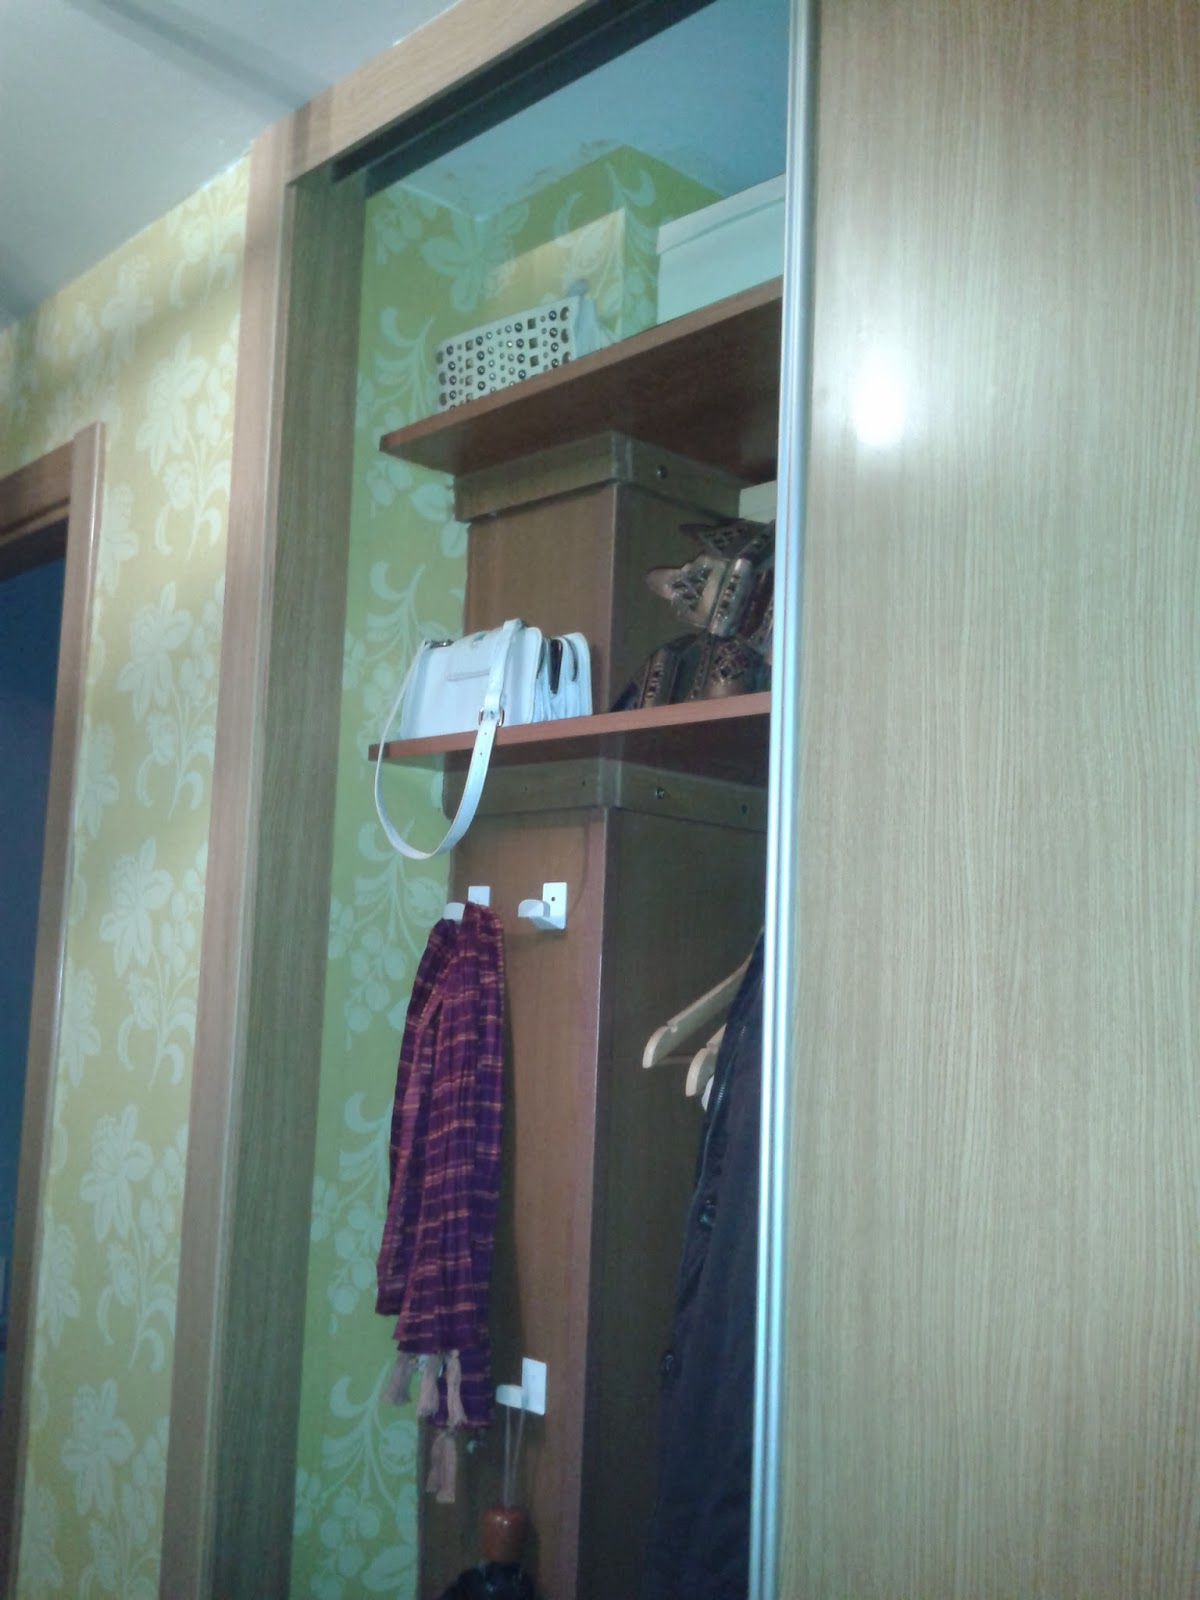 Lacasaconchanclas papel pintado como fondo de armario for Papel pintado armario